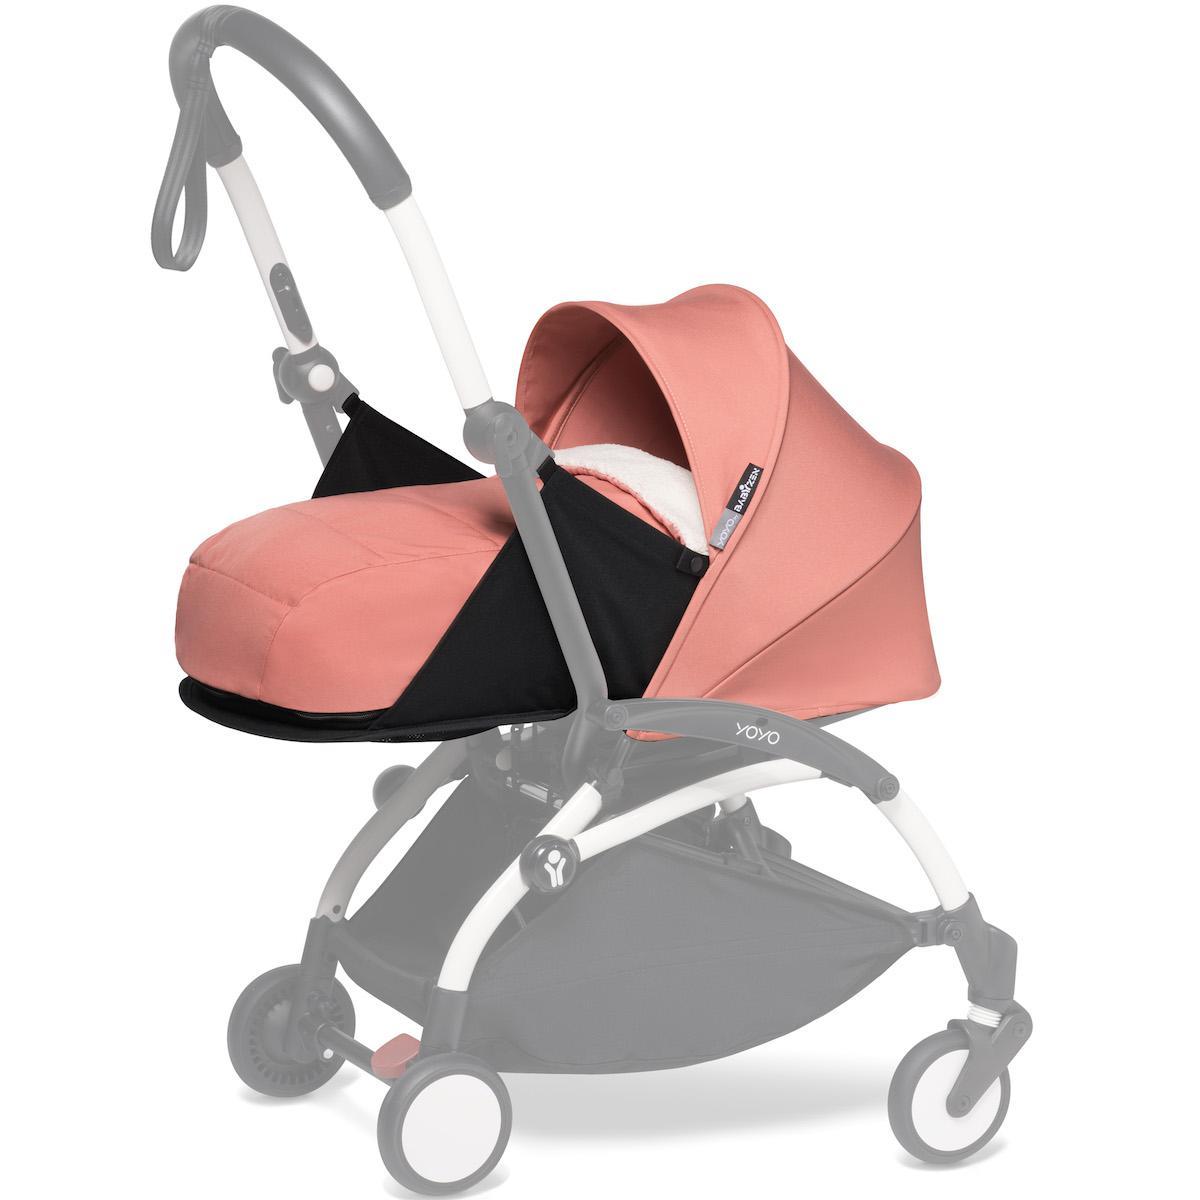 Neugeborenen-Set Kinderwagen YOYO 0+ BABYZEN ginger